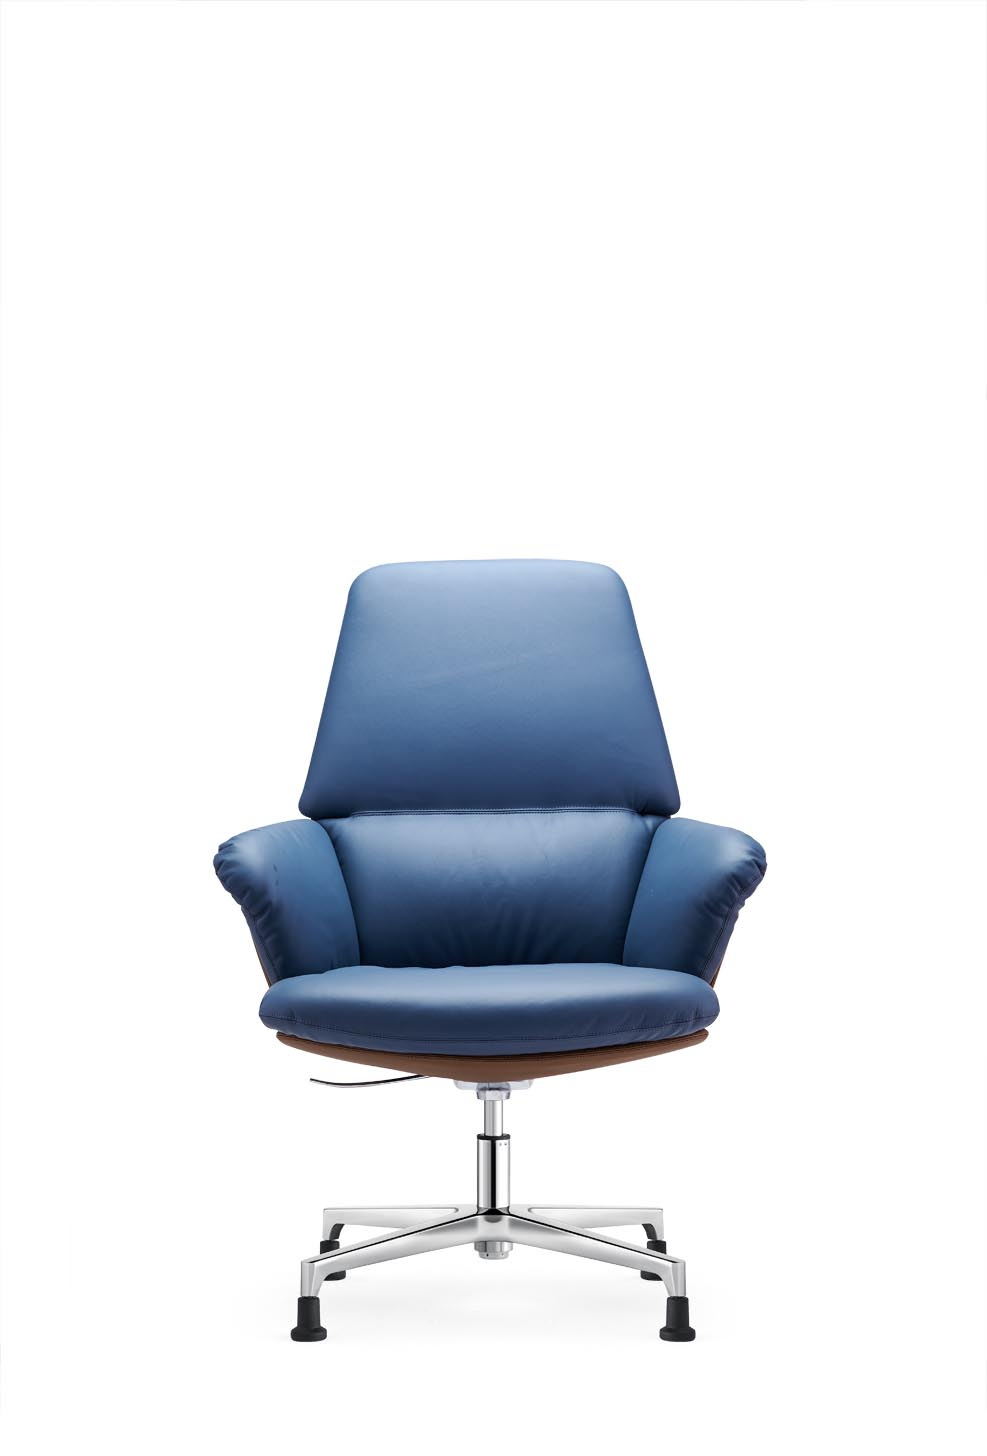 HY-4013經理椅